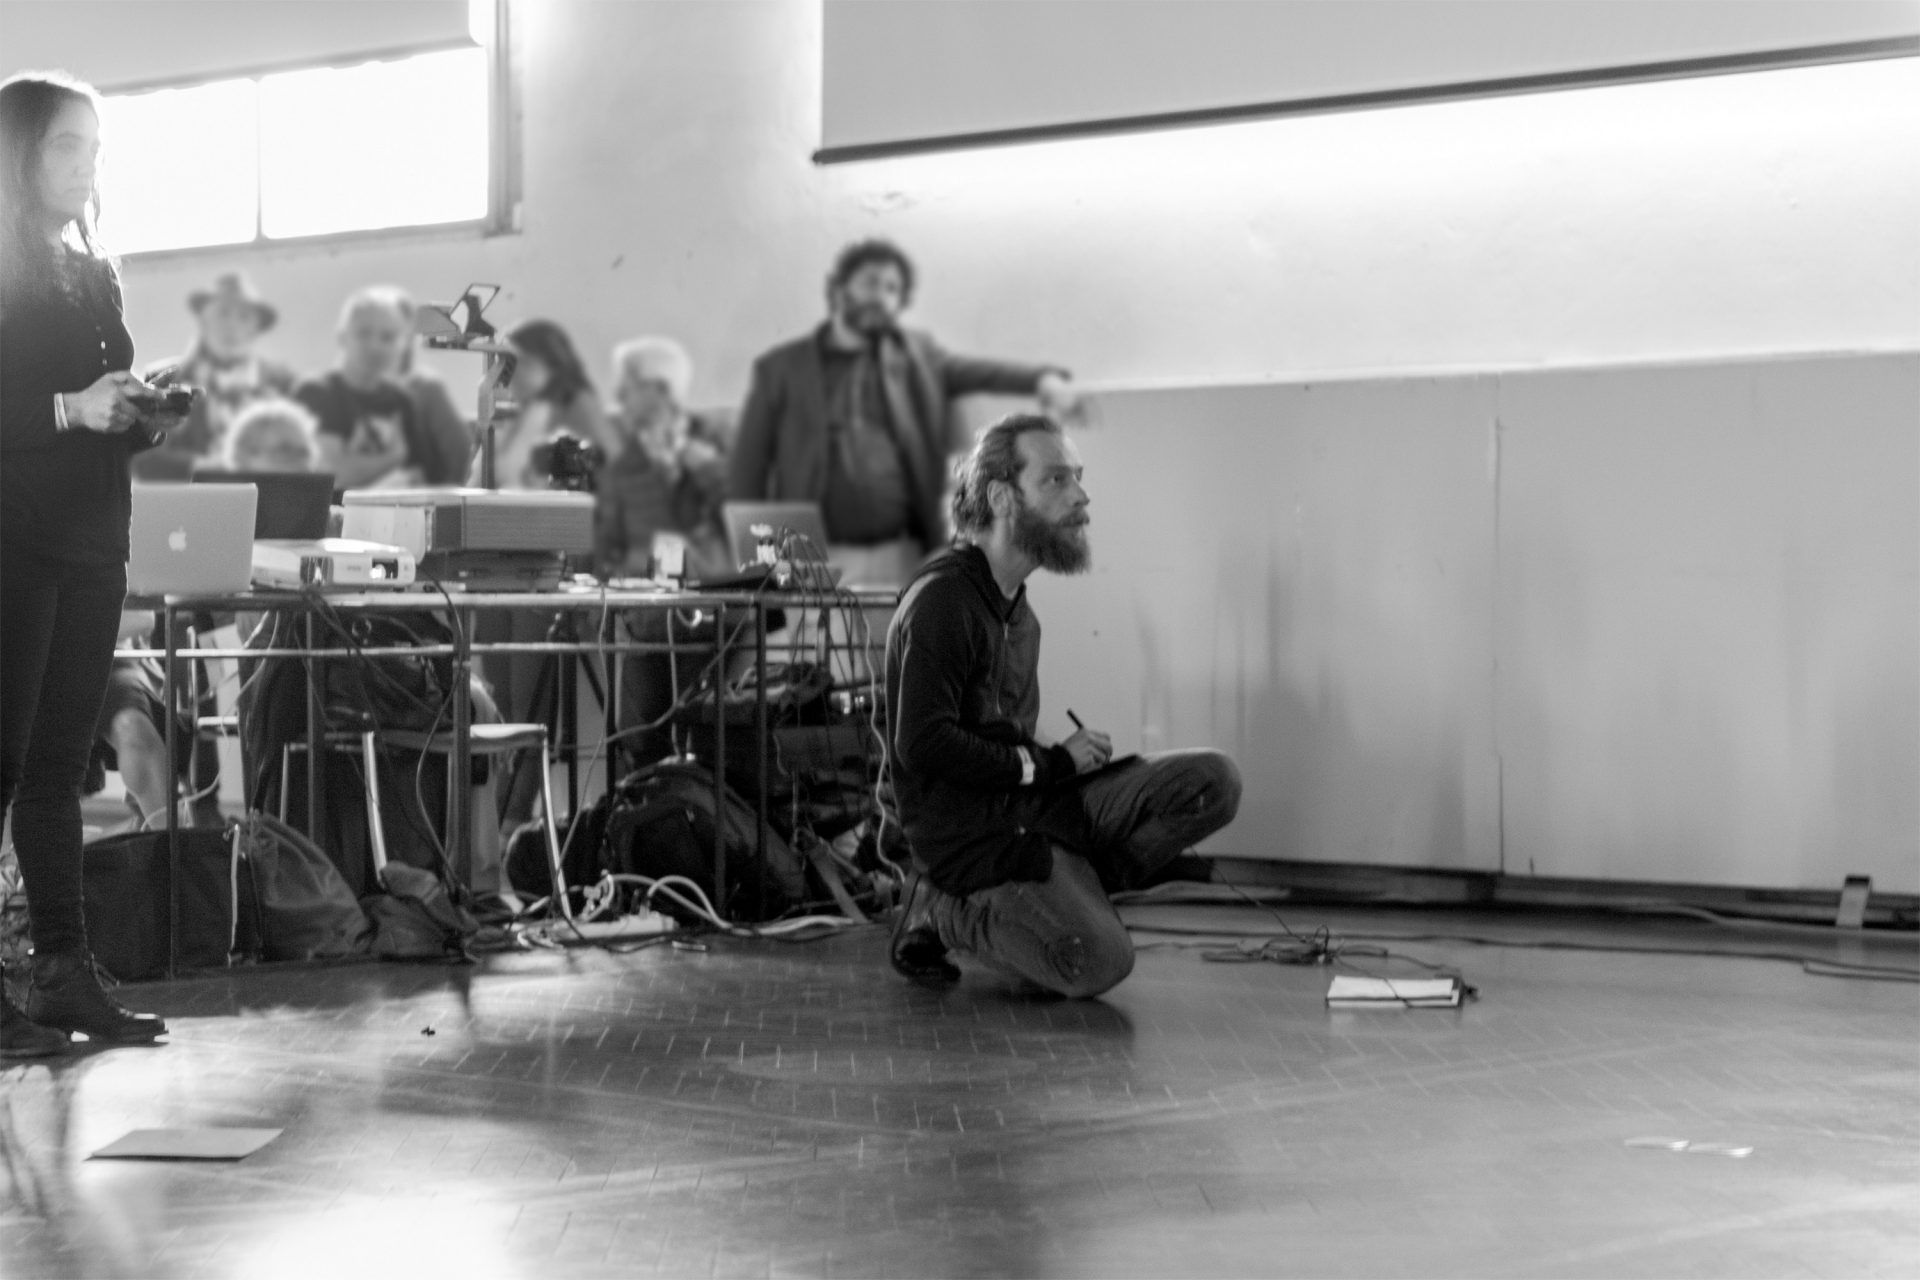 Mitopoiesi 001 — feat. Roberto Paci Dalò, Biennale Disegno Rimini, Sala Arengo/Rimini, 2016